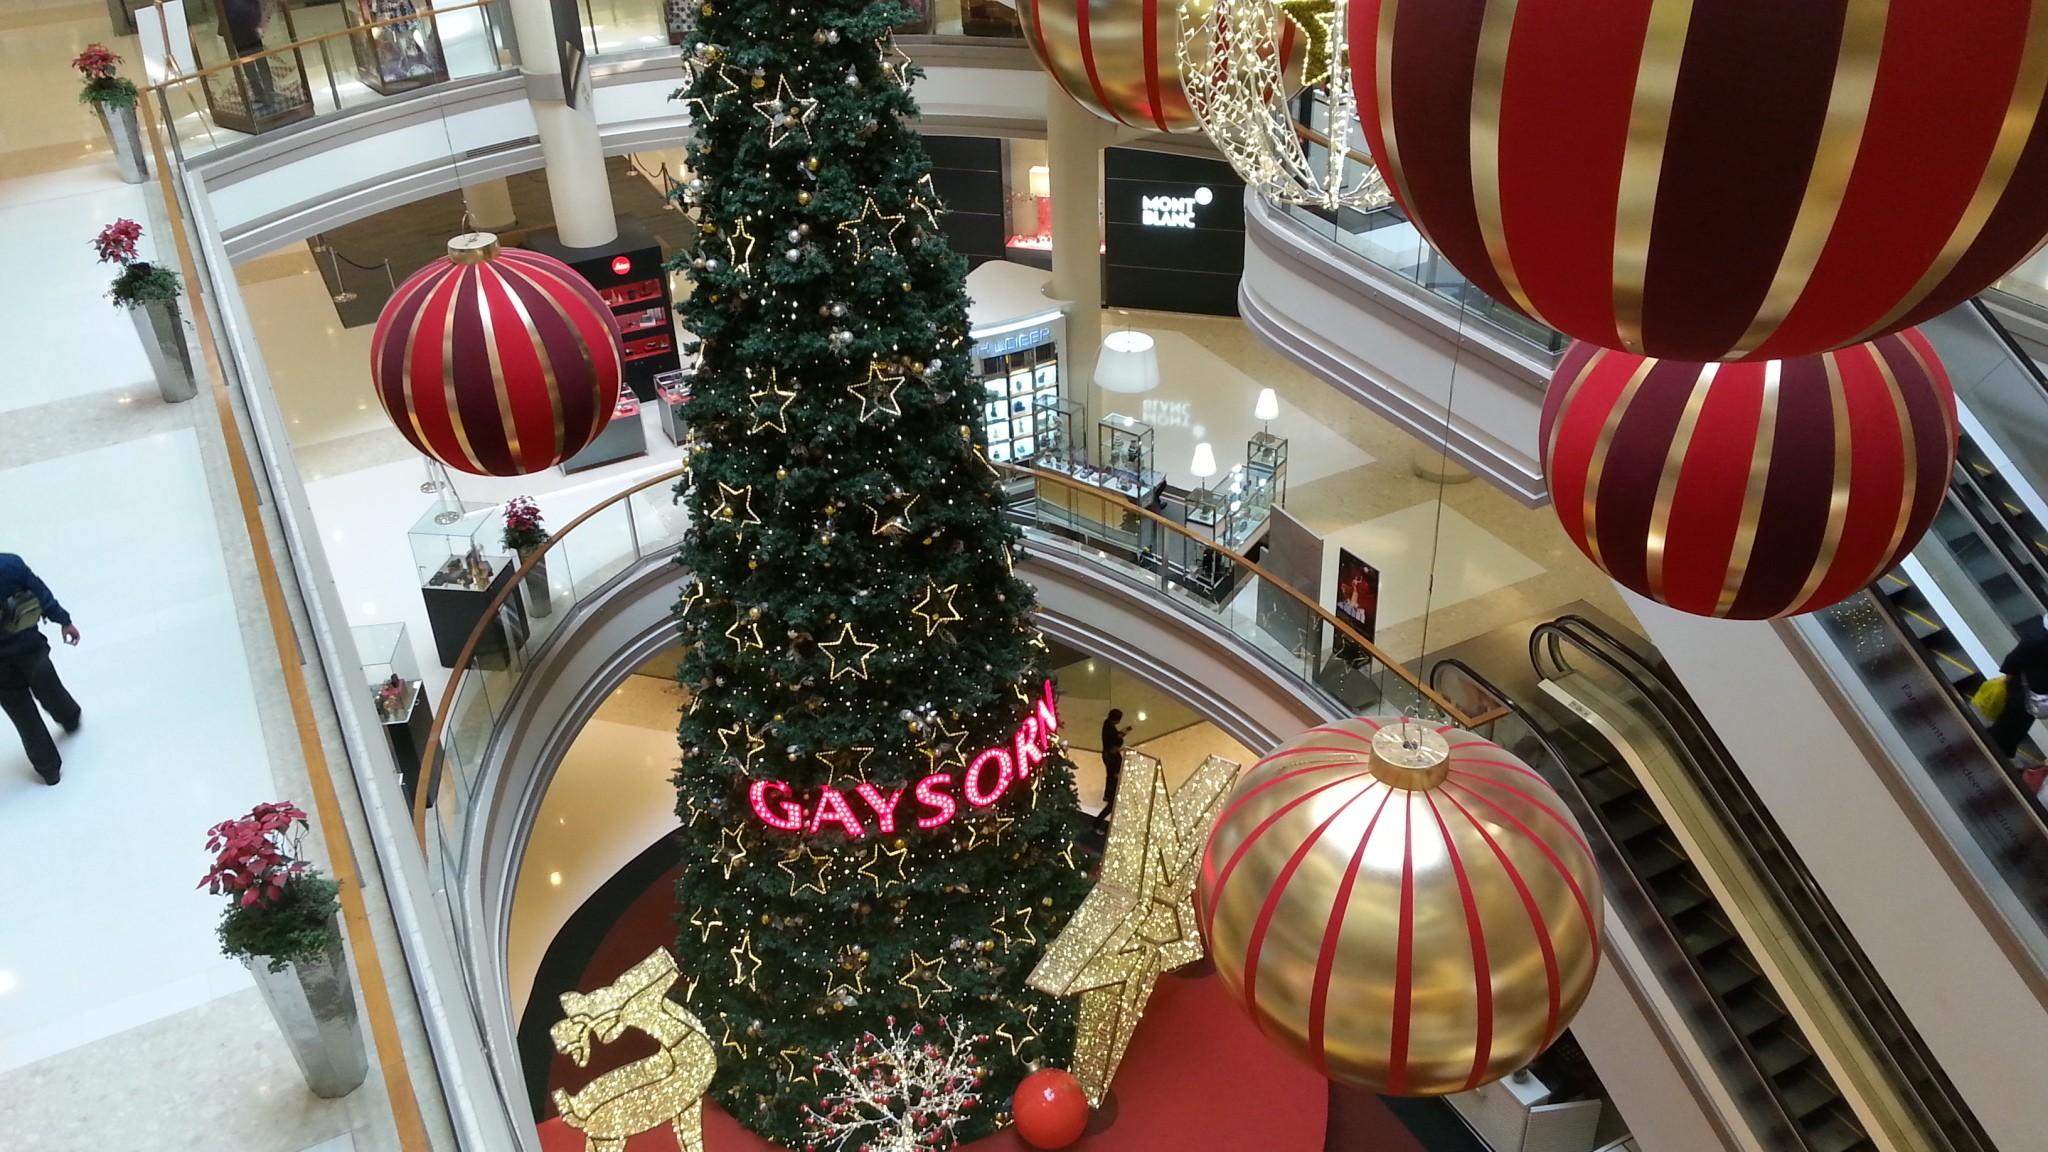 Gaysorn Plaza Christmas decorations Dec 2013